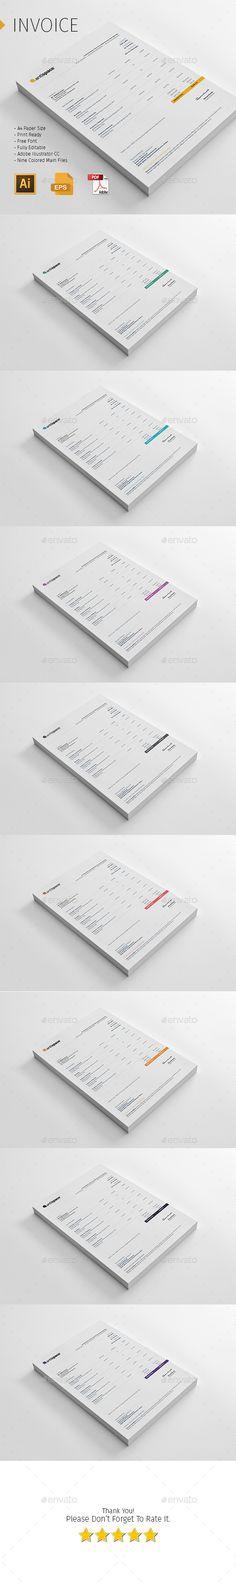 Invoice Template #design Download: http://graphicriver.net/item/invoice-template/12753166?ref=ksioks